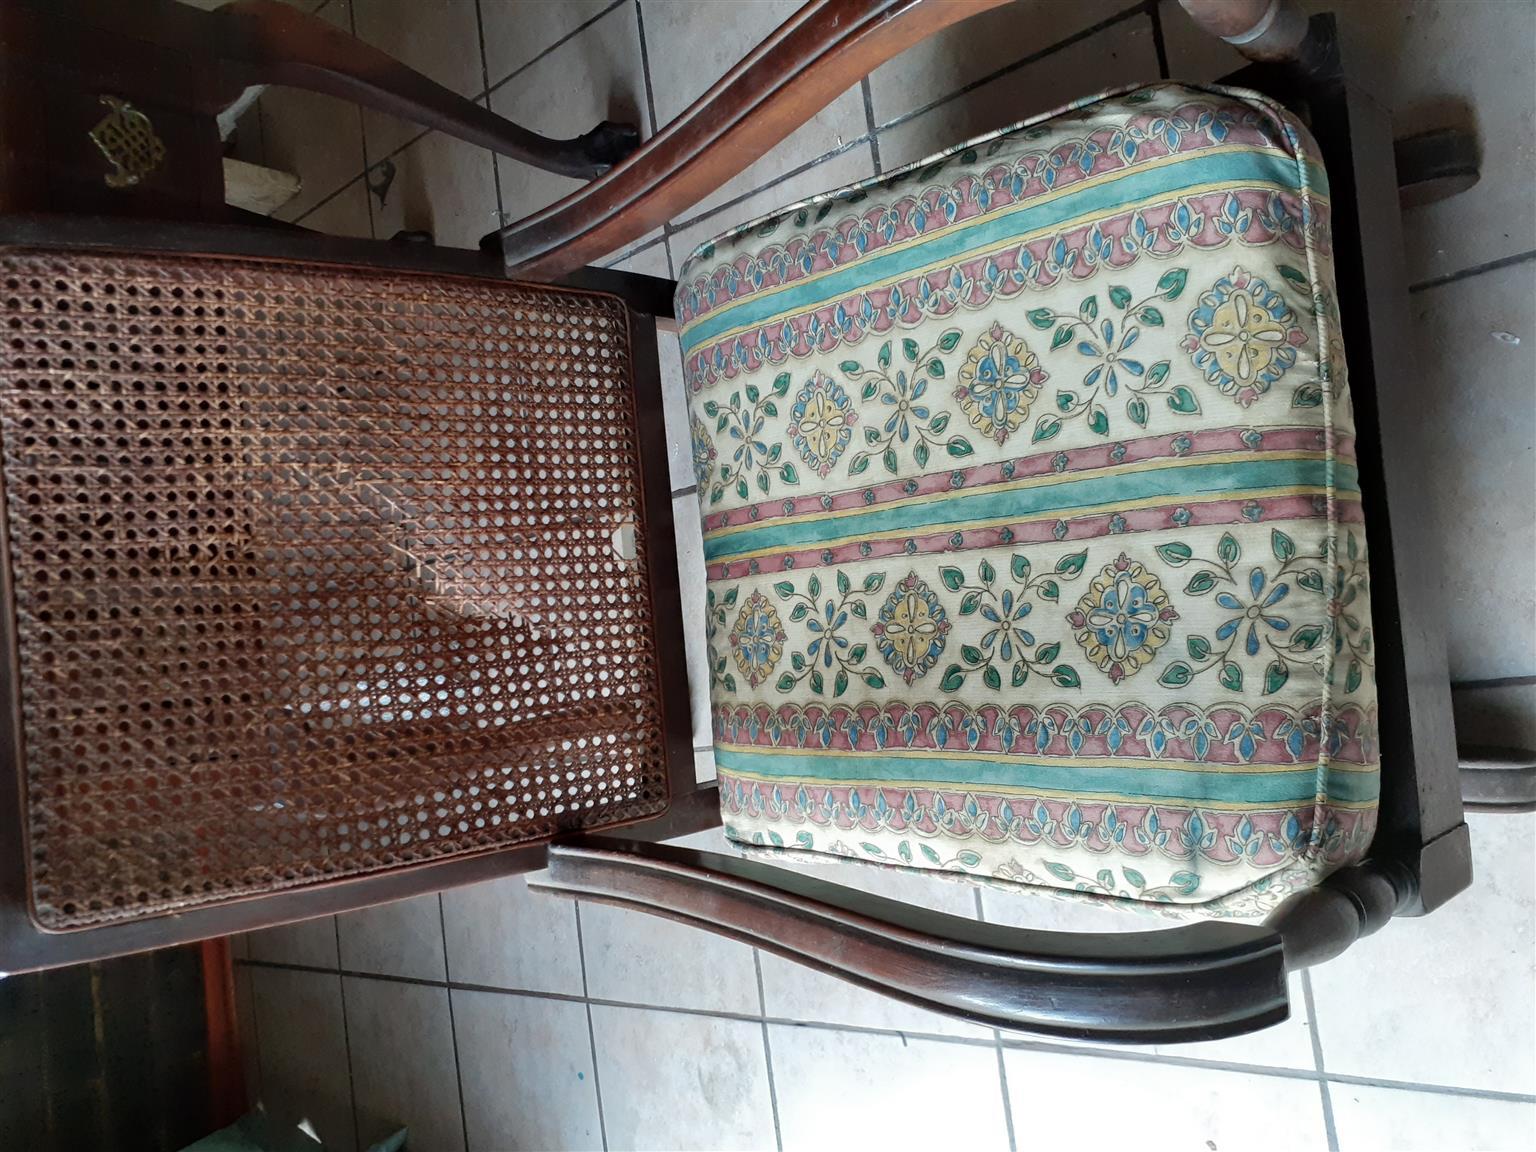 Antique/Vintage wooden rocking chair